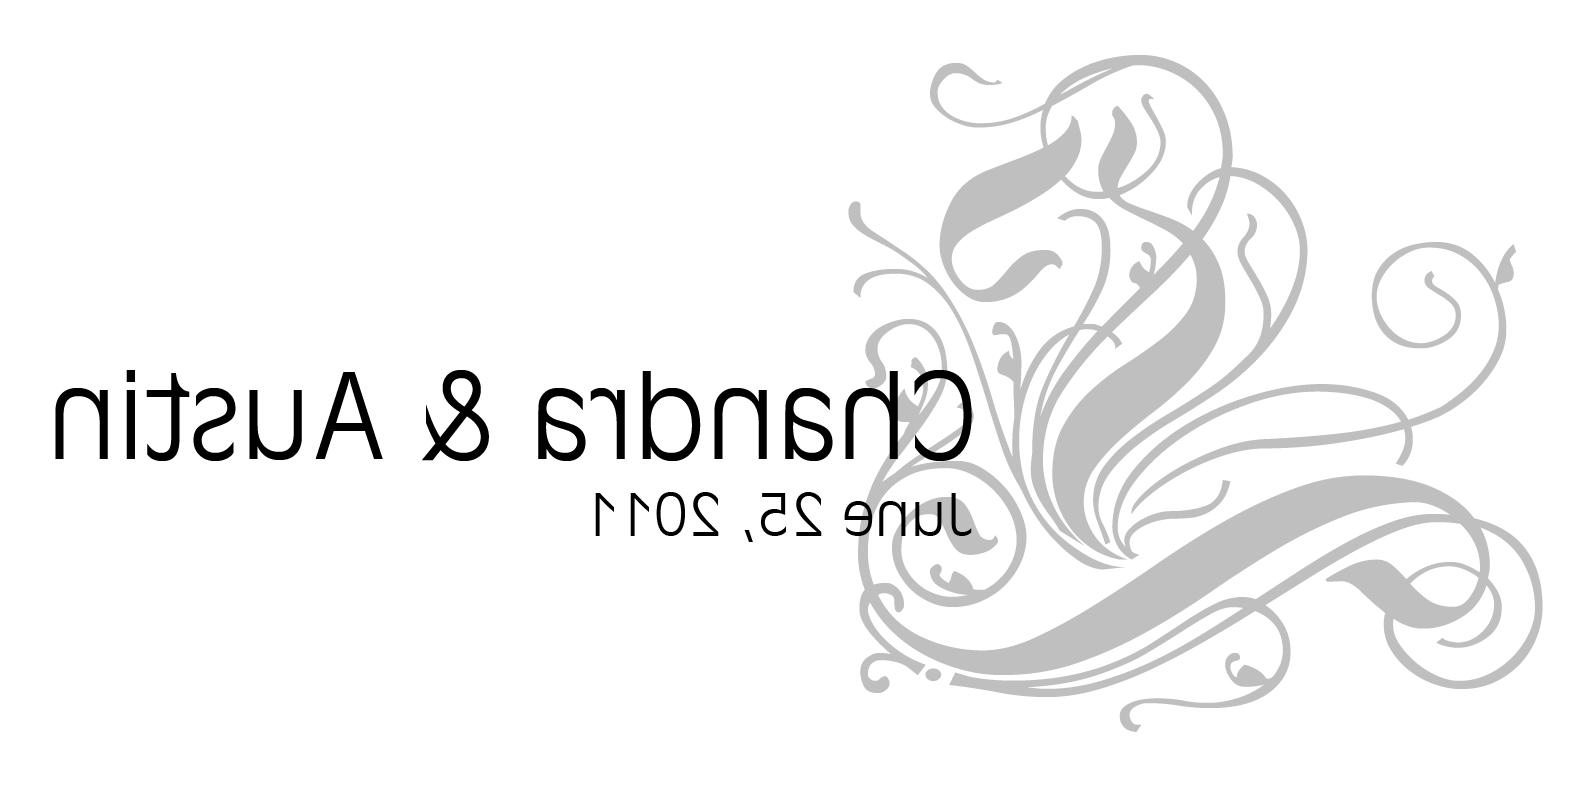 The Aylee Bits monogram